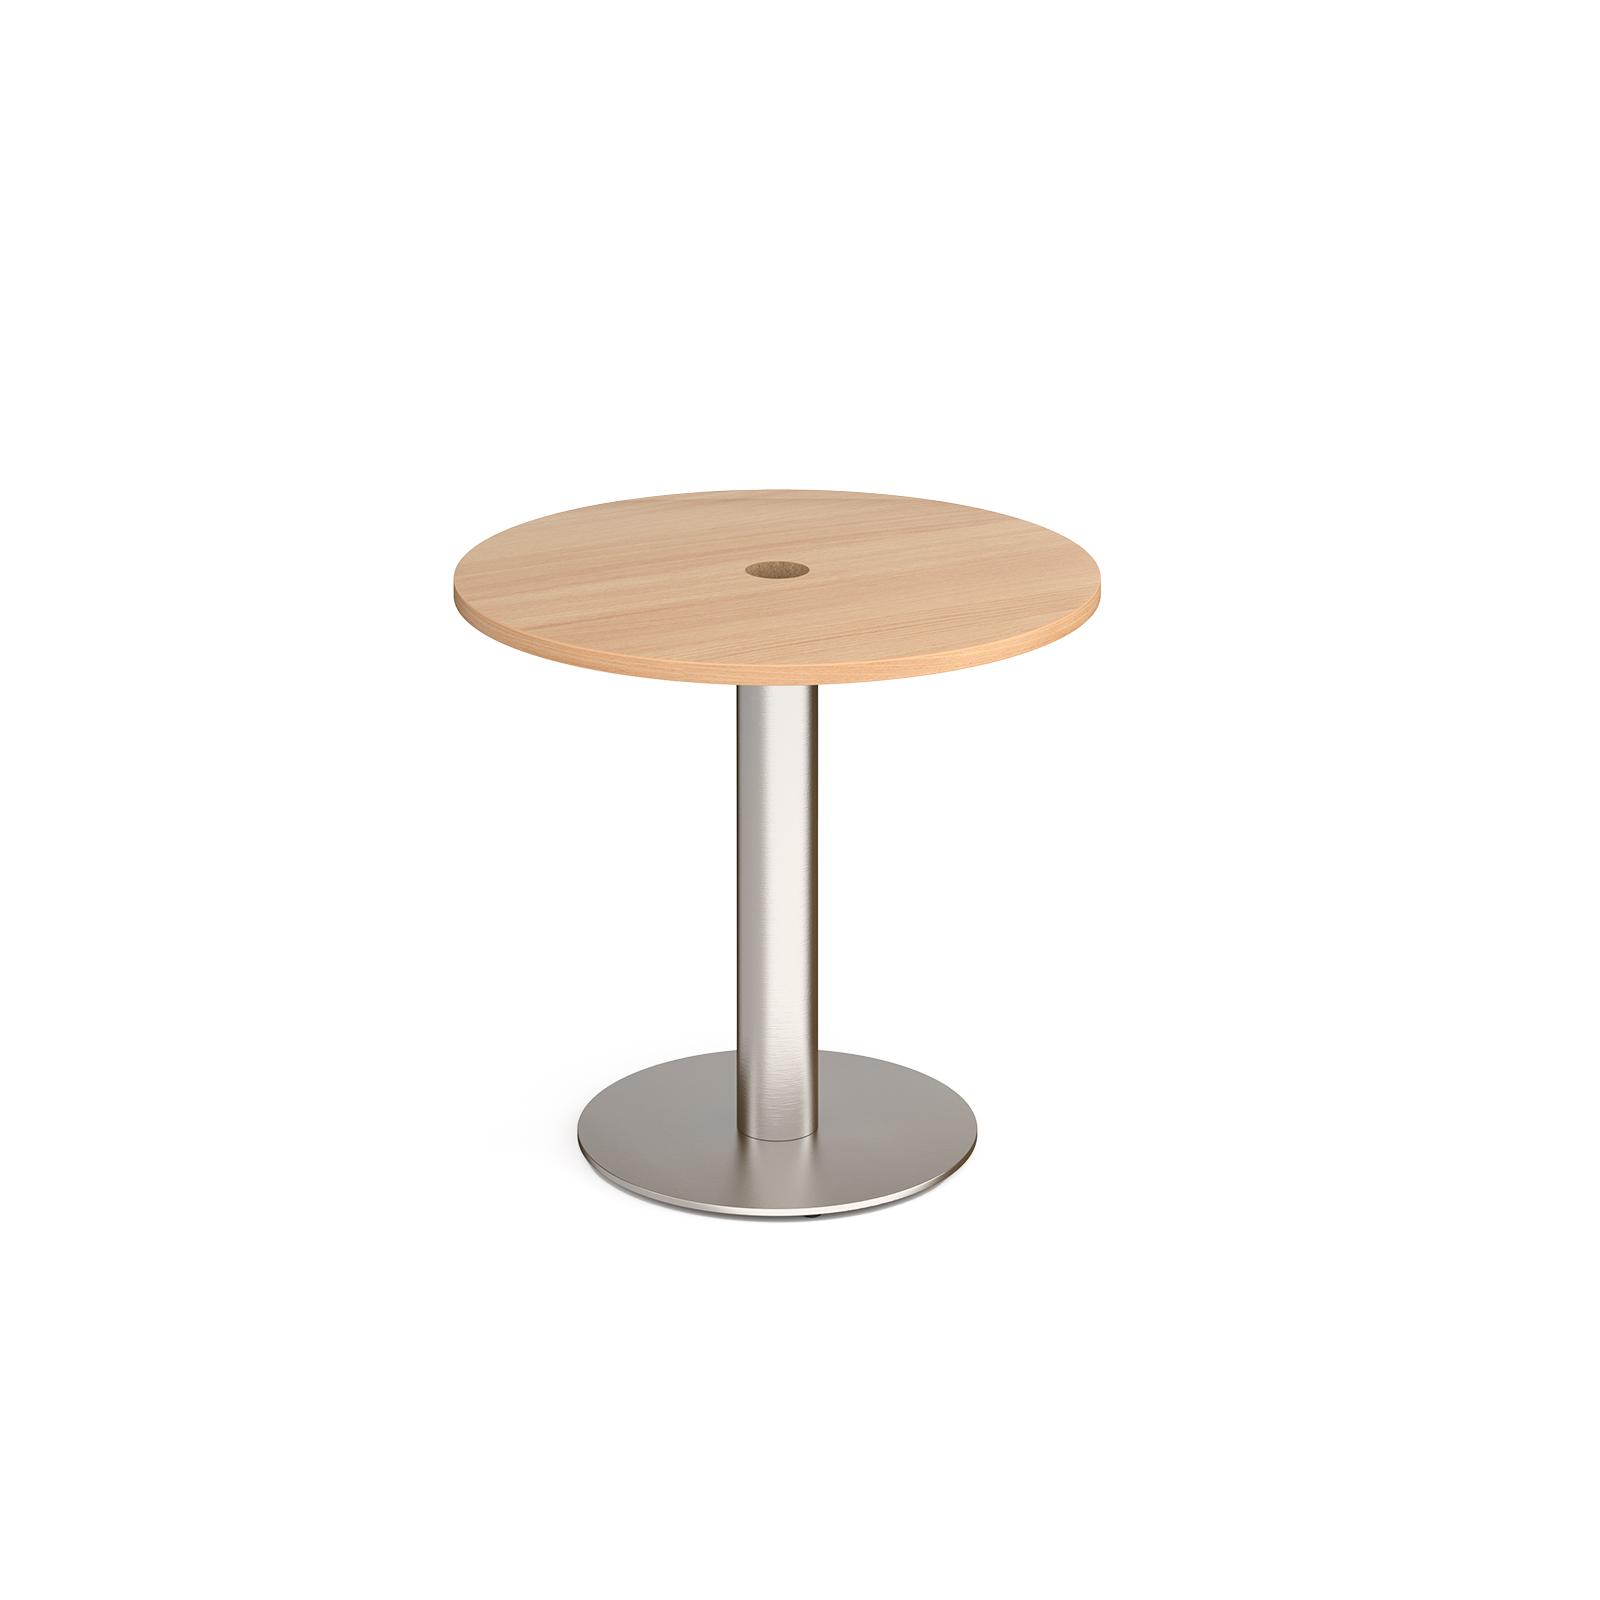 Monza circular power ready dining table